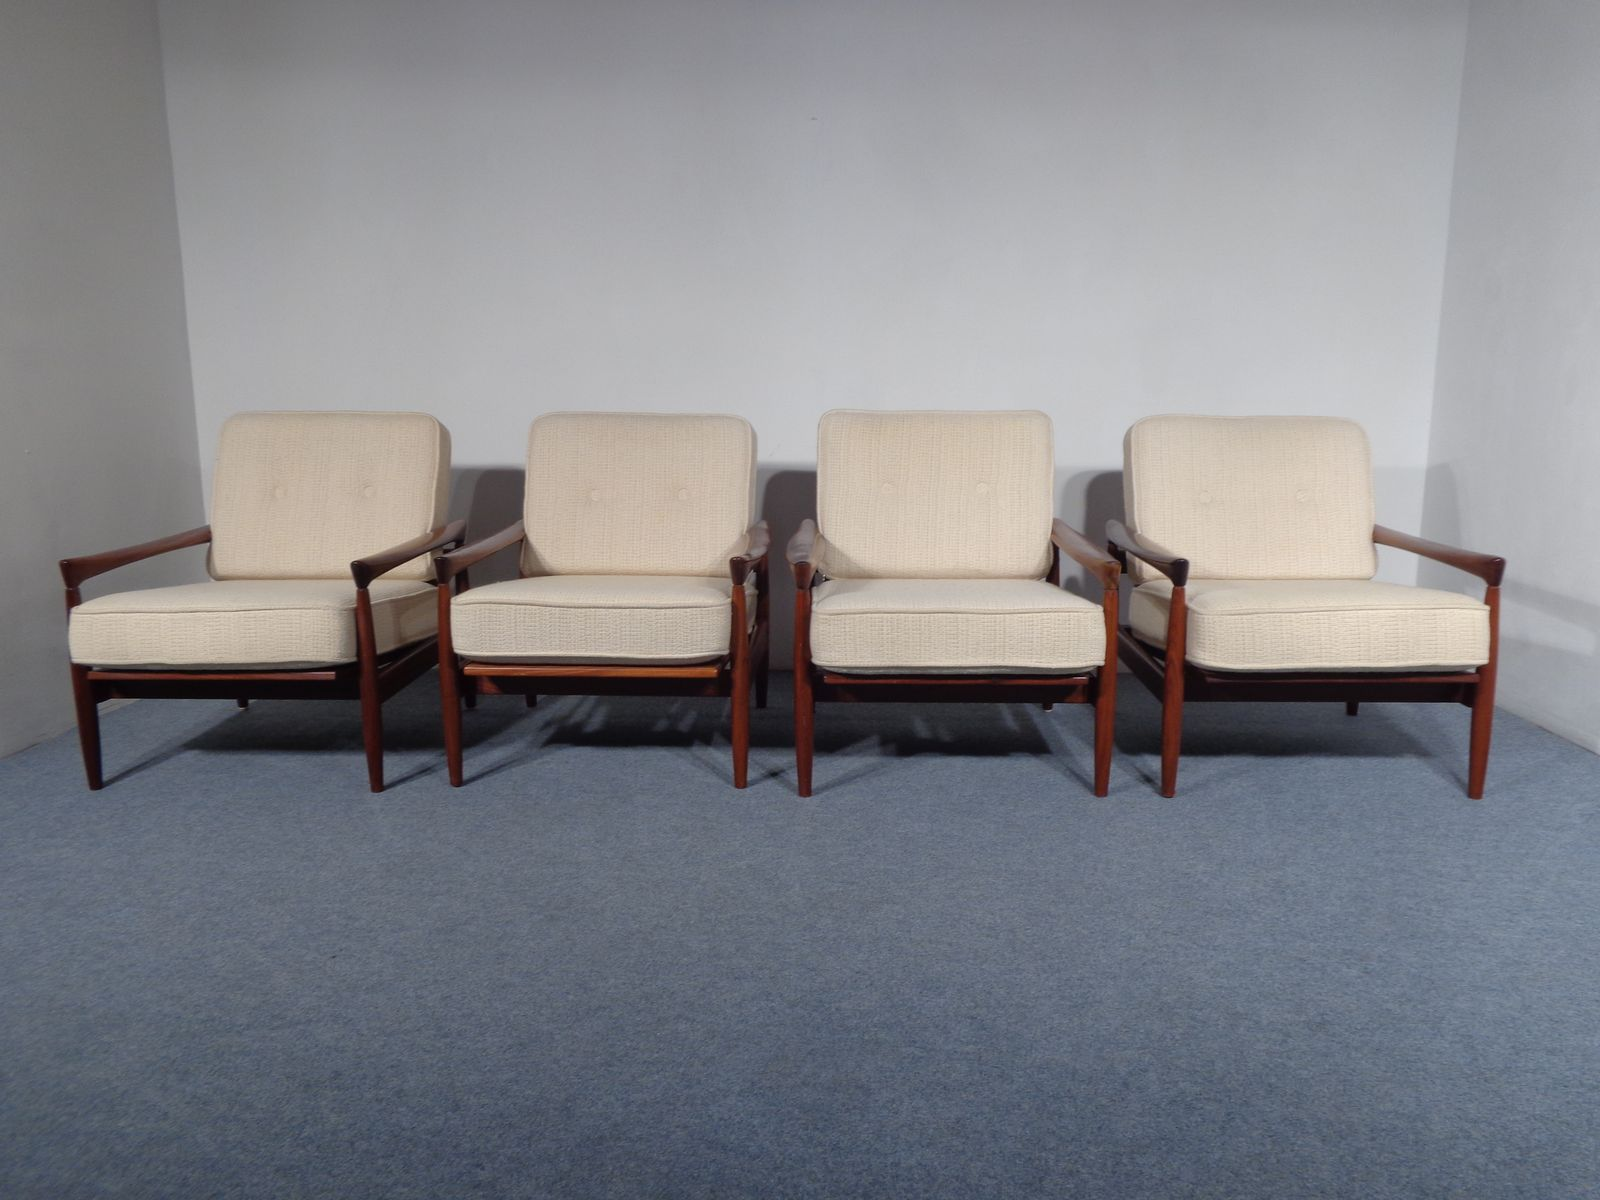 Swedish Teak Lounge Chair By Erik Wörtz For Bröderna Andersson, 1960s